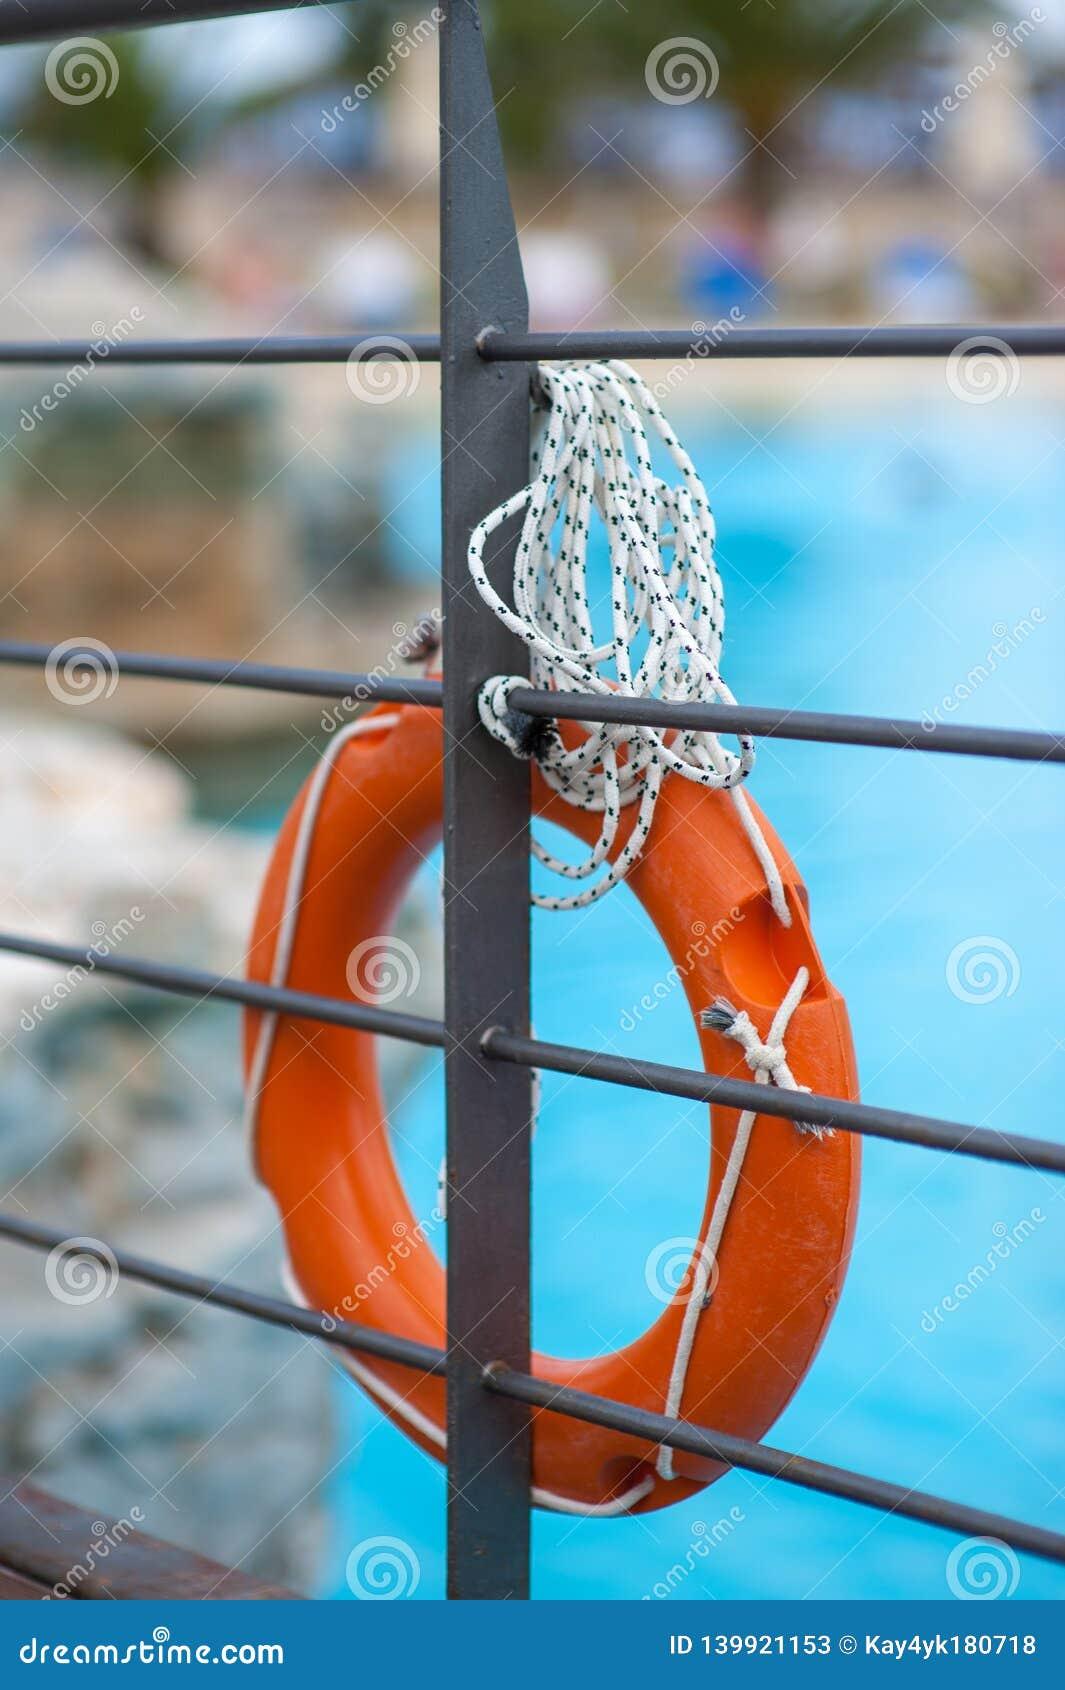 Orange life buoy with rope near the pool hanging on the bridge